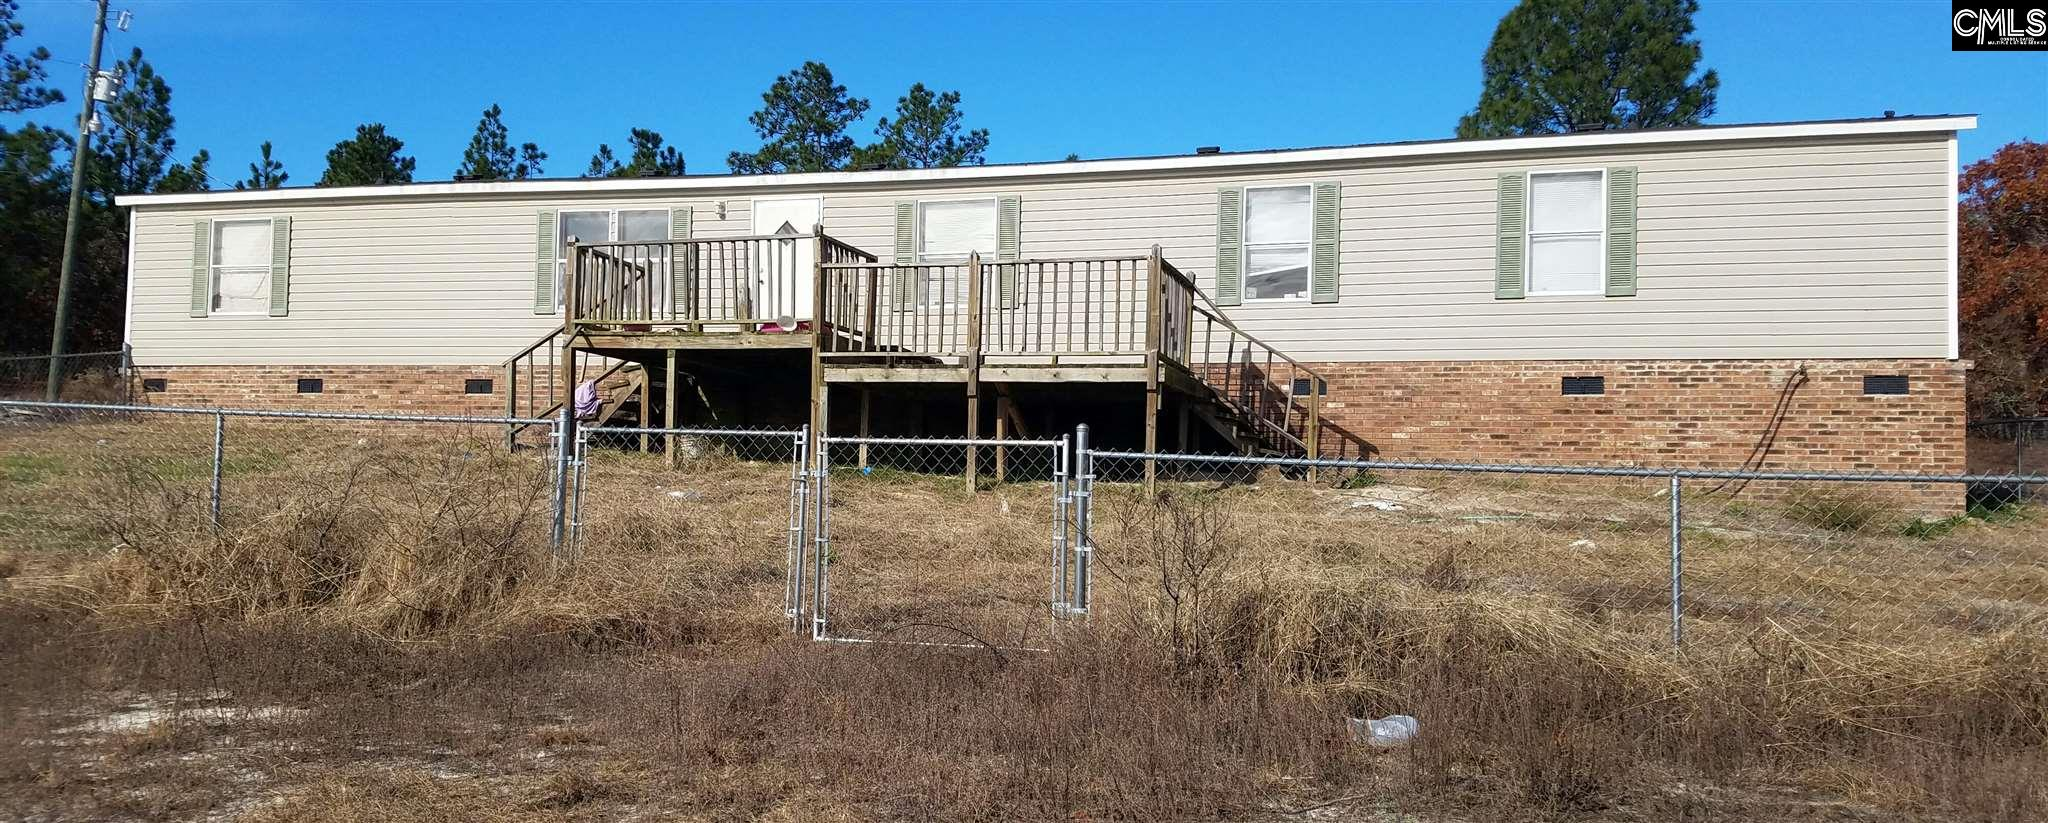 1636 Fort Jackson Lugoff, SC 29078